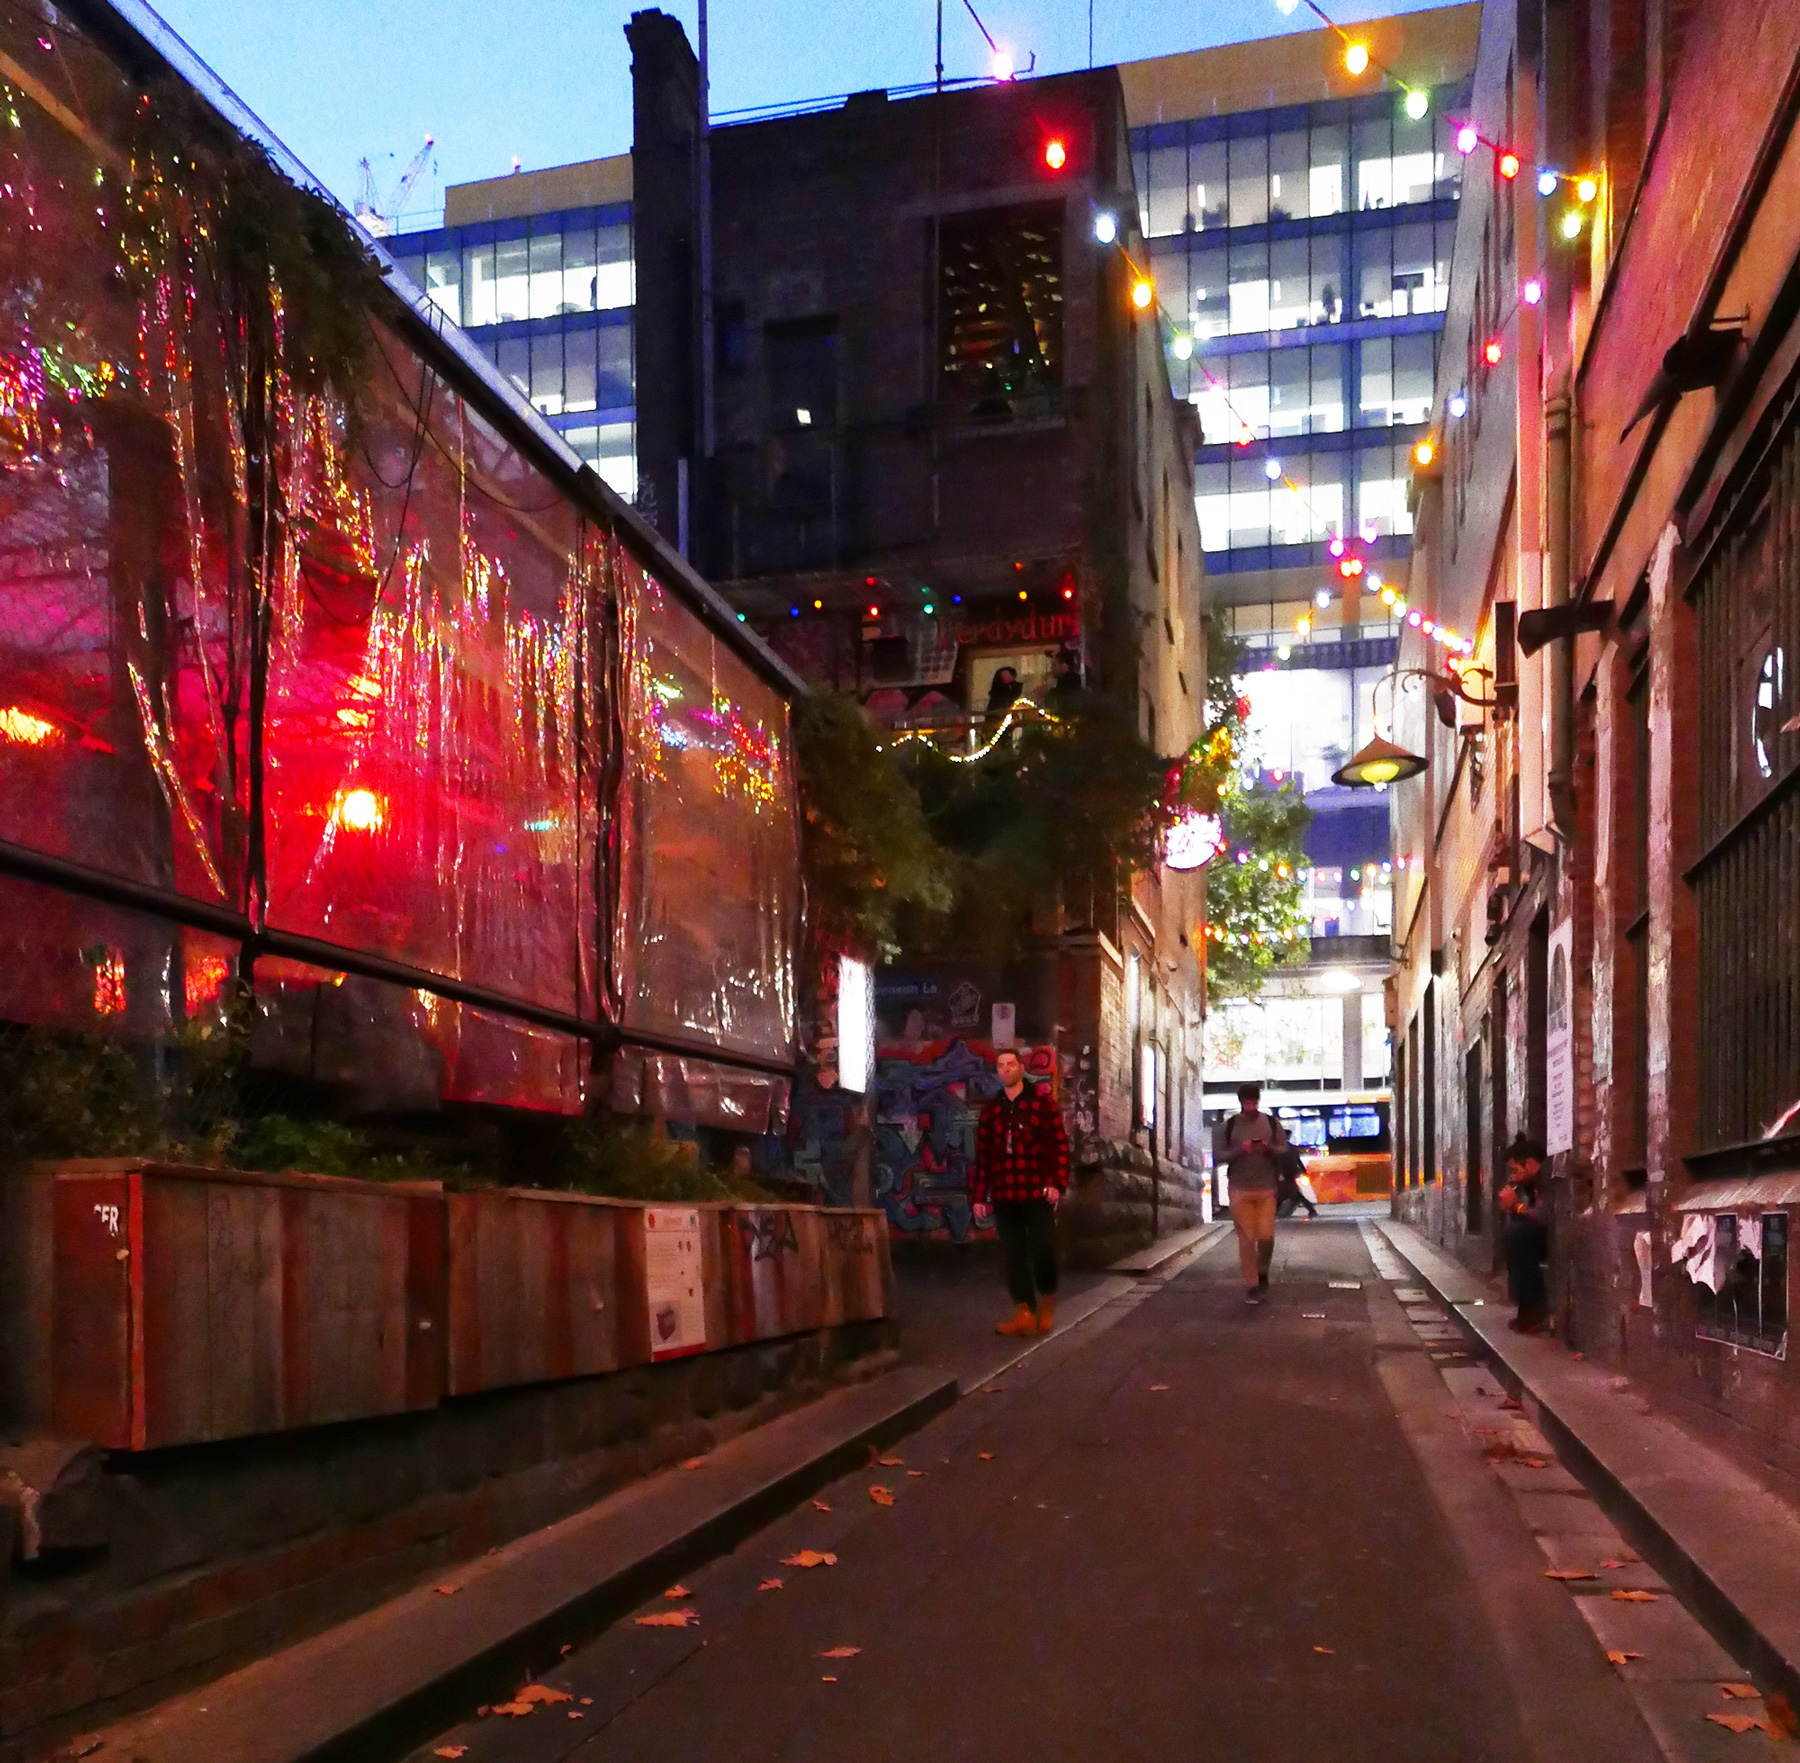 Section8-night-tattersalls-towards-lonsdale.jpg